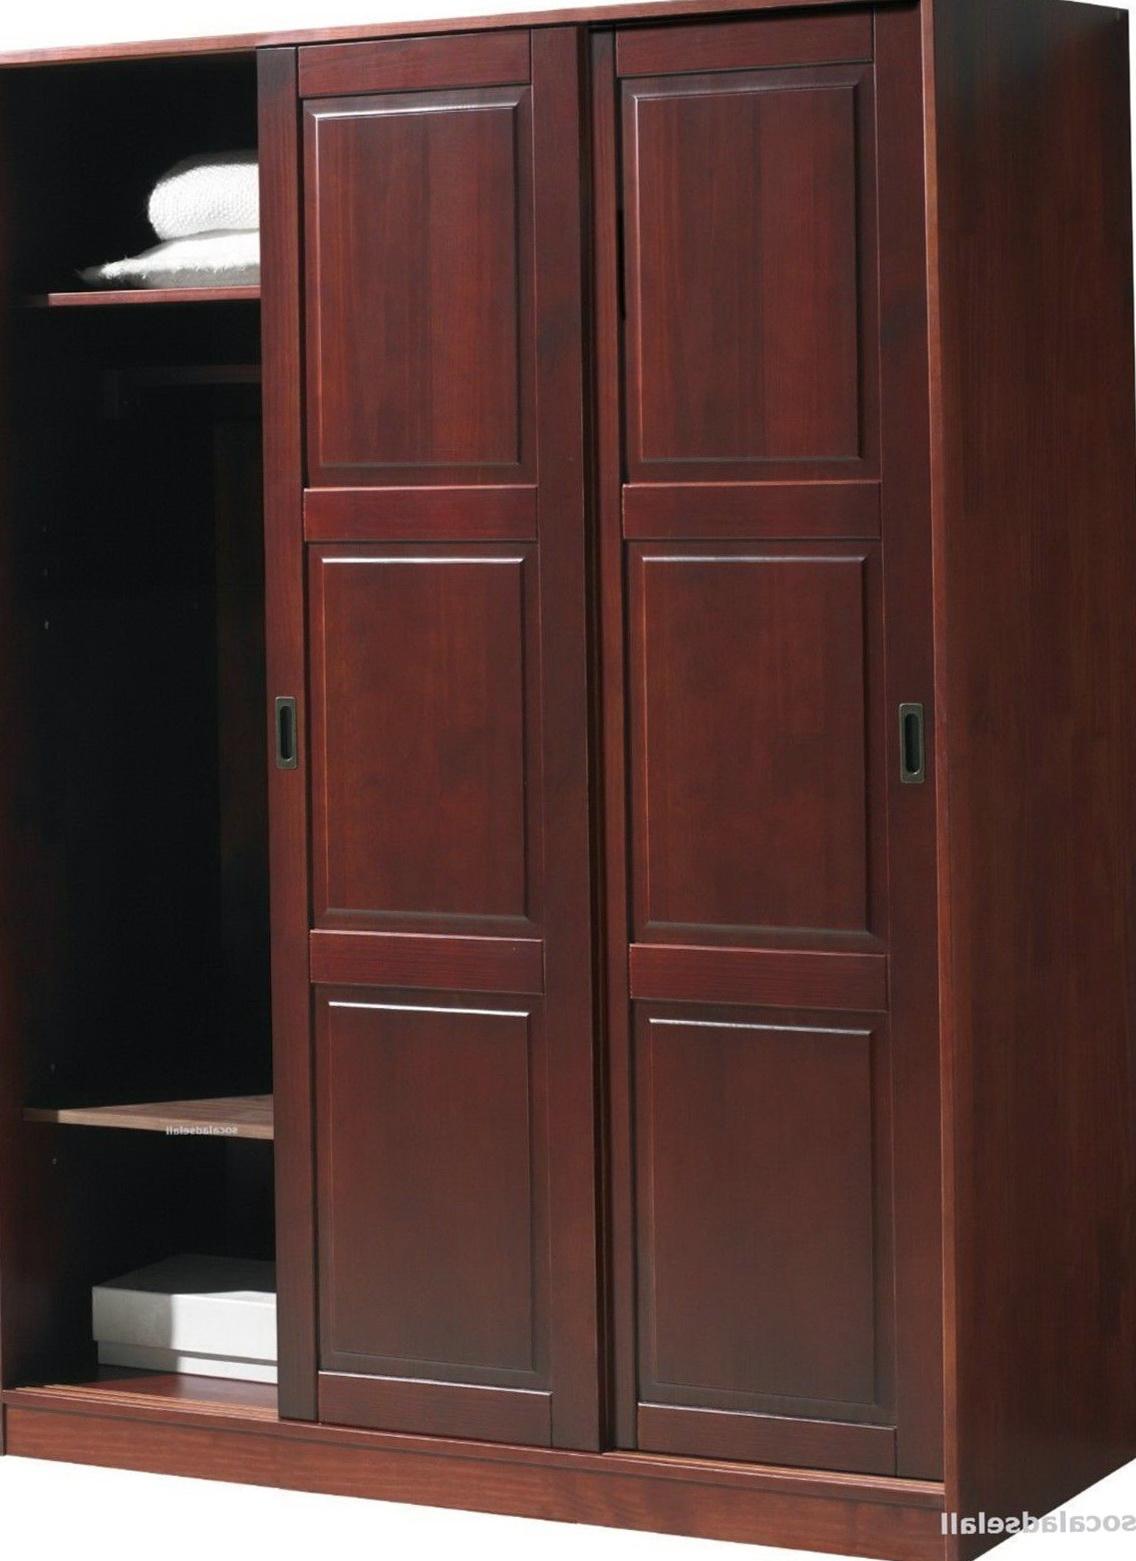 Sliding Wood Closet Doors Lowes